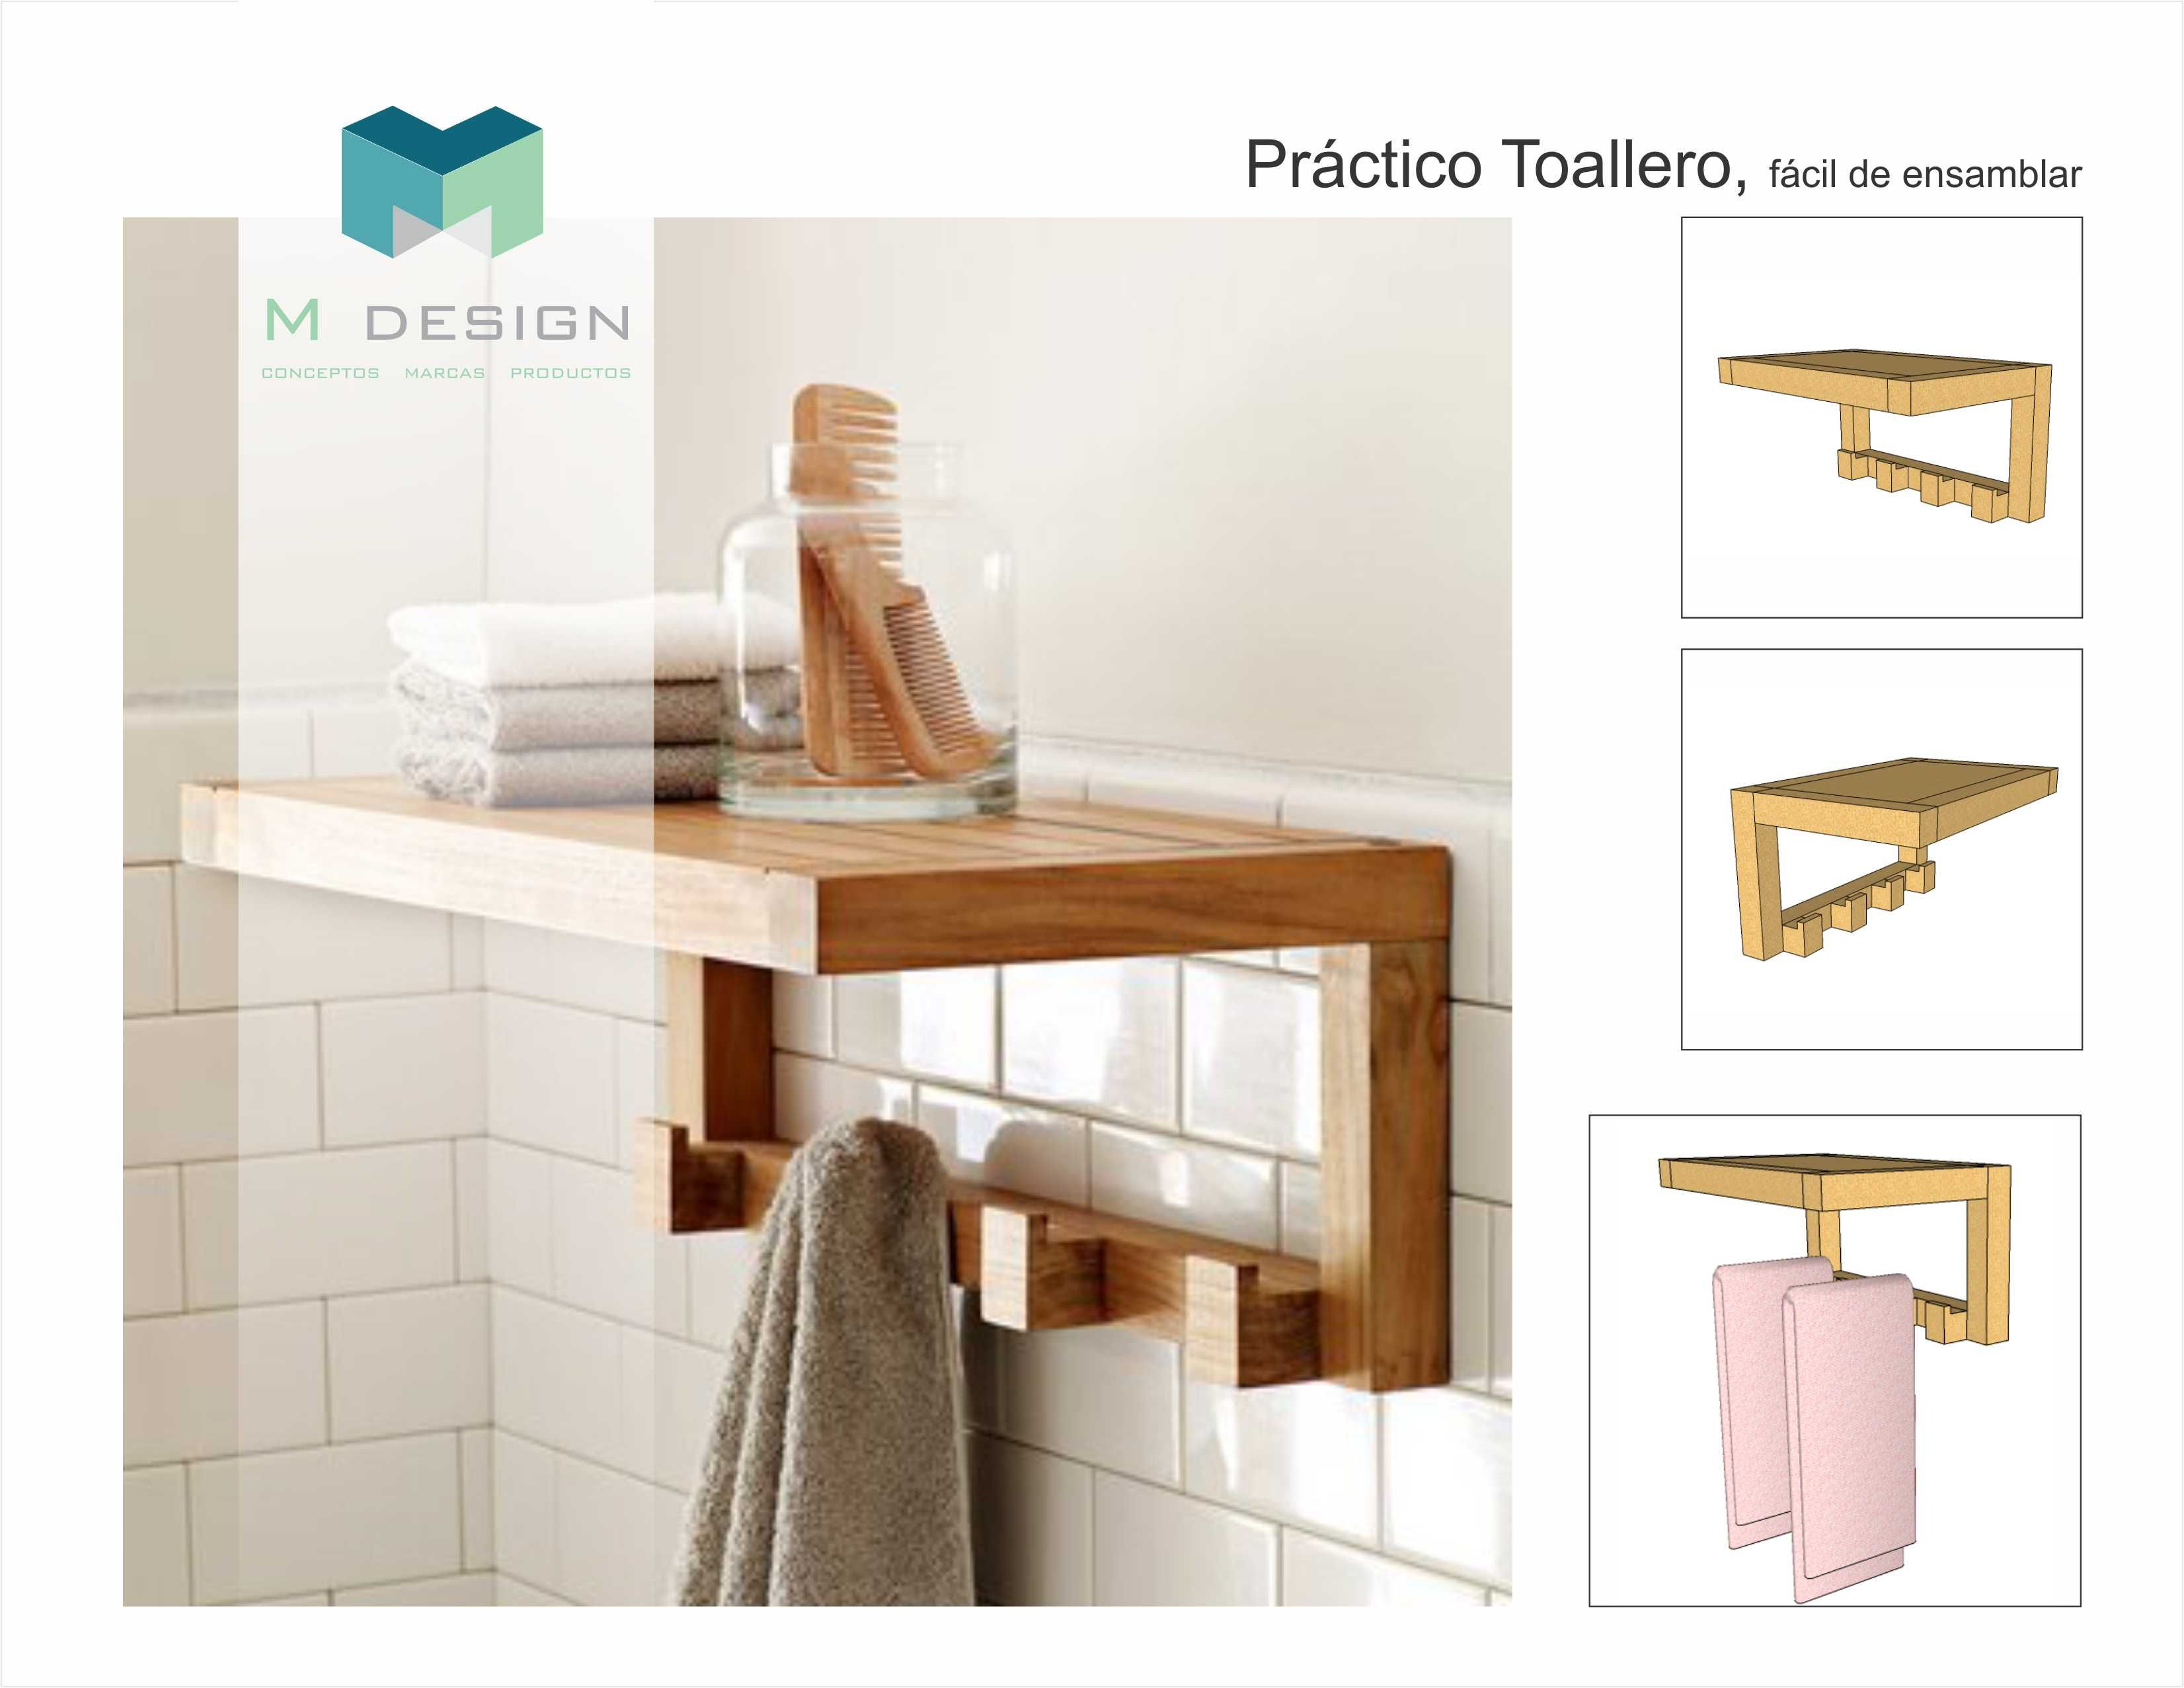 Toallero | Toallero de madera, Estantes del cuarto de baño ...